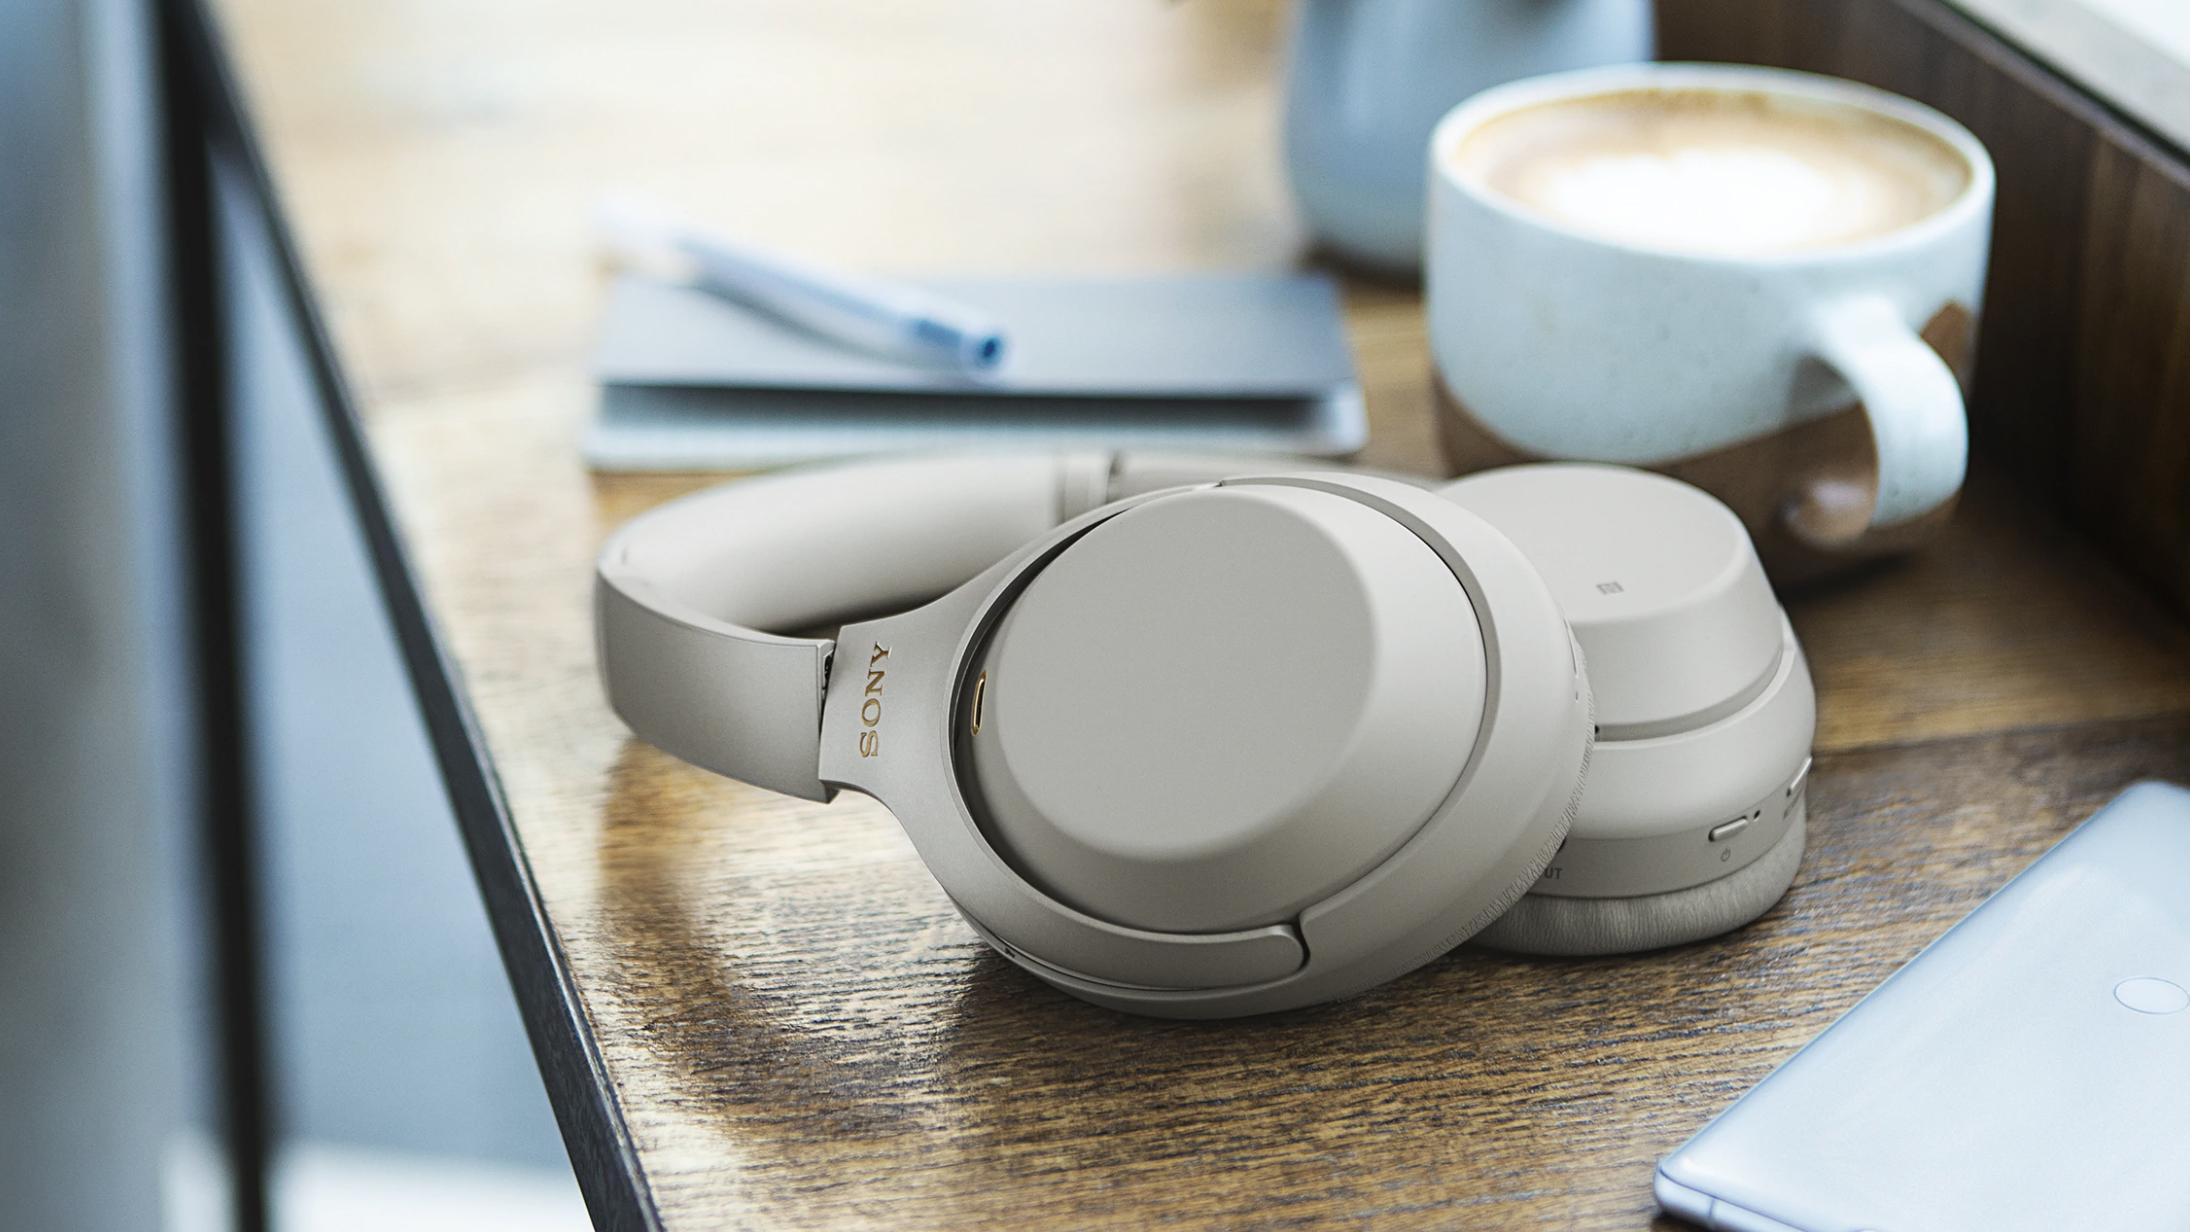 Sony WH1000XM3 noise canceling headphones